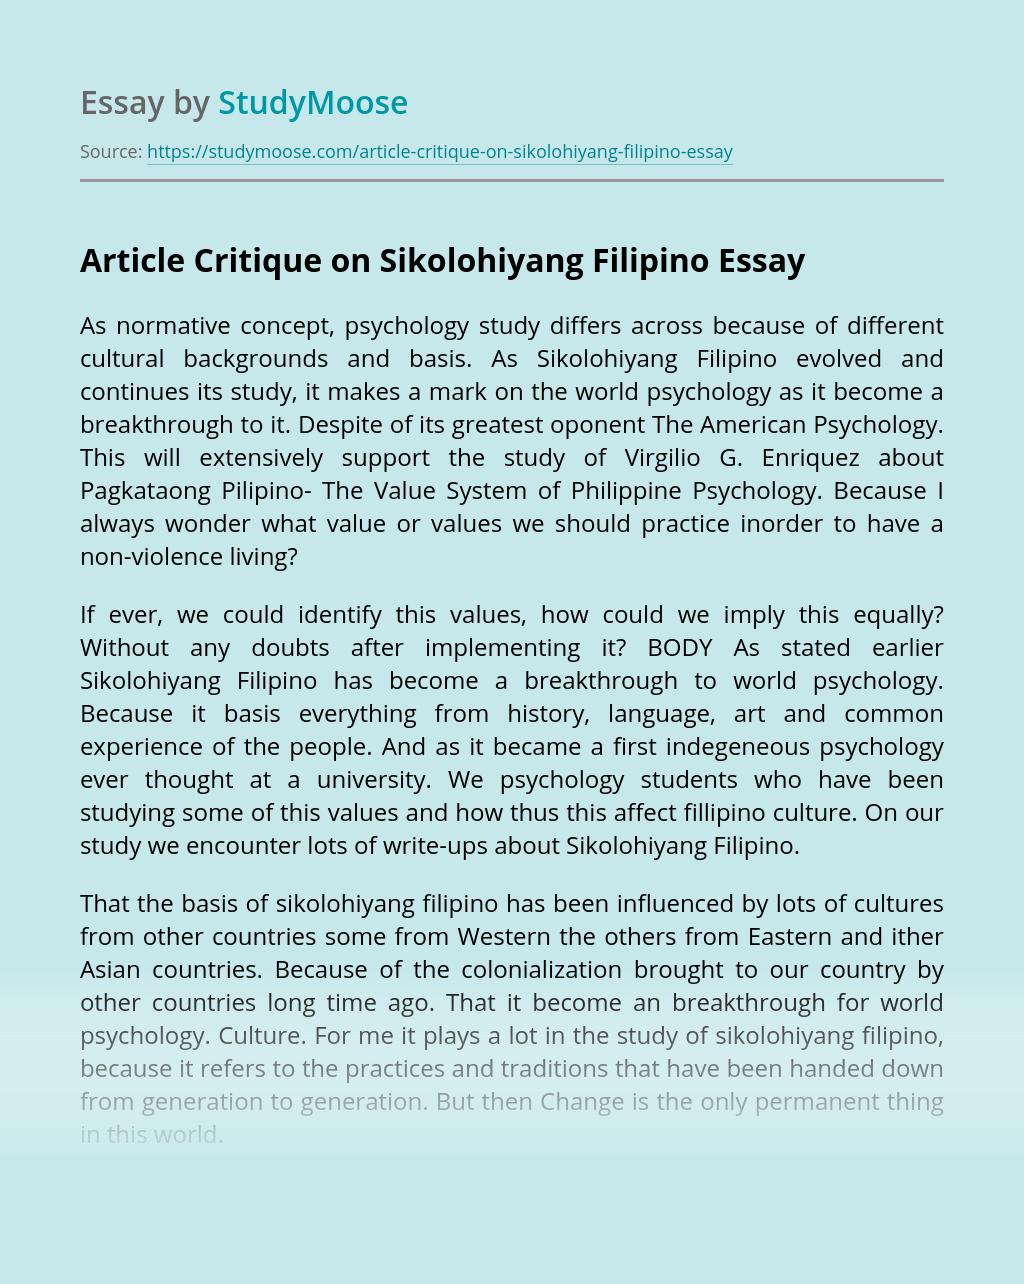 Article Critique on Sikolohiyang Filipino